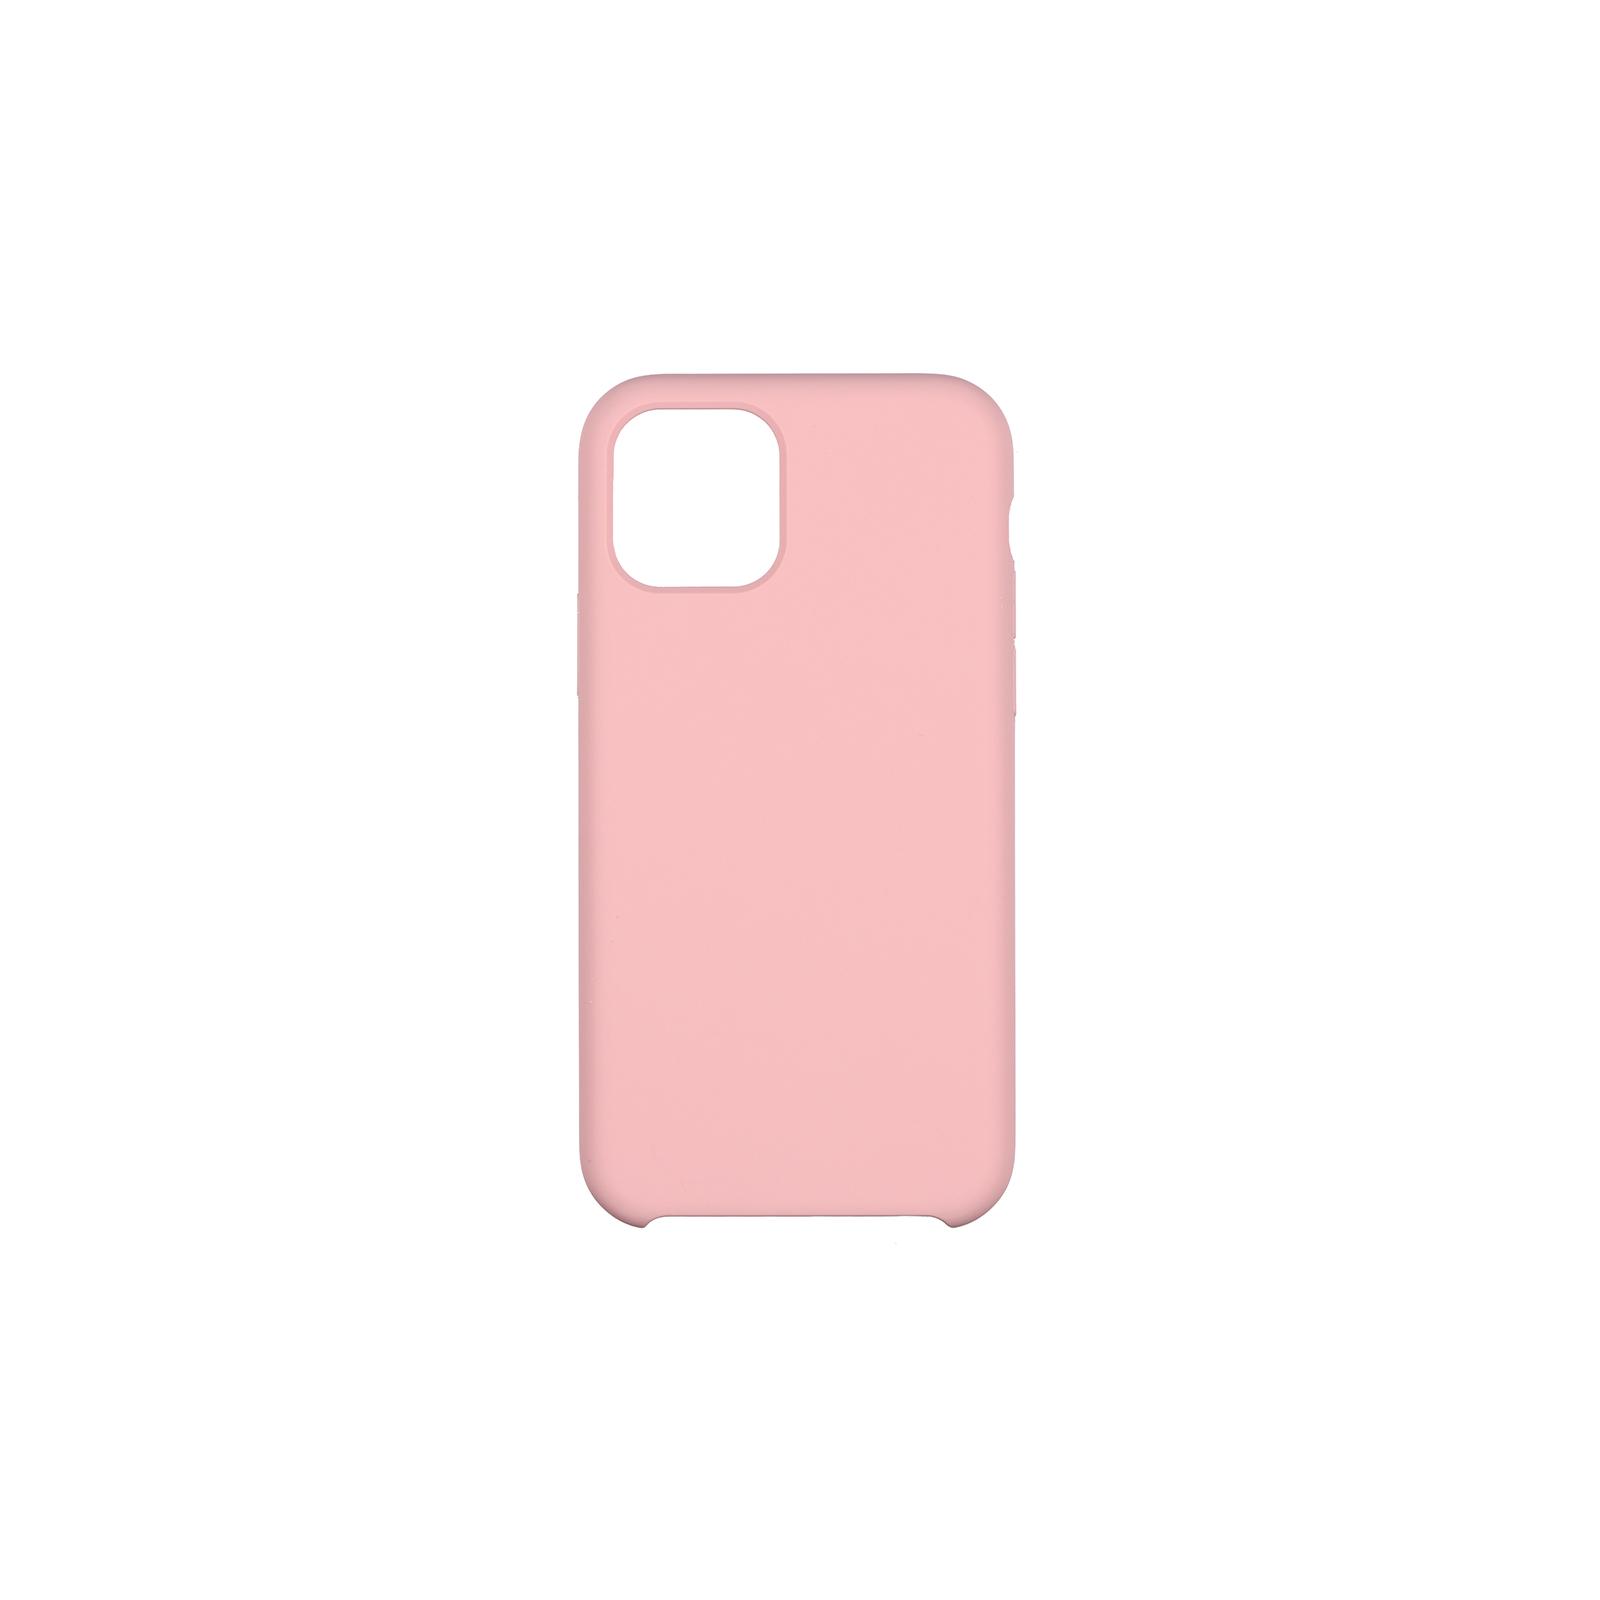 "Чехол для моб. телефона 2E Apple iPhone 11 Pro (5.8""), Liquid Silicone, Pink (2E-IPH-11PR-OCLS-PK)"